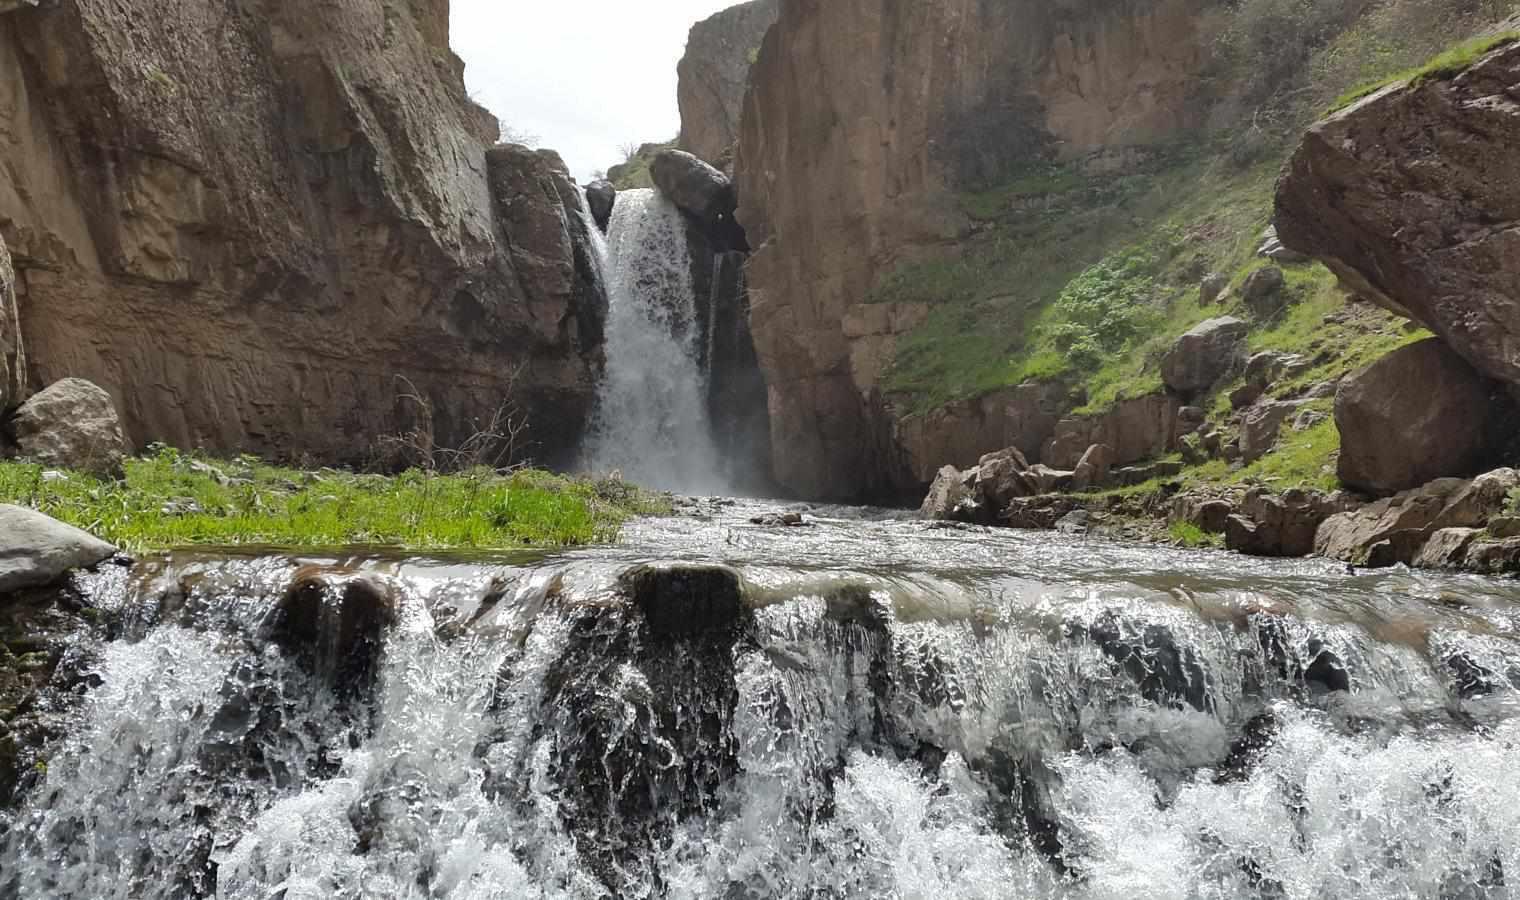 آبشار هشترخان طارم